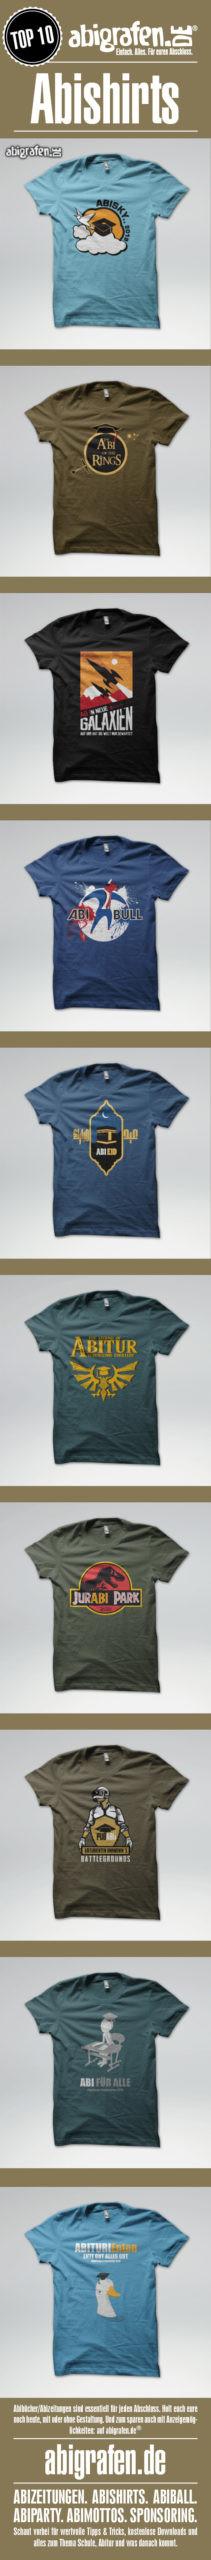 abishirt-shirt-top-bunt-weiß